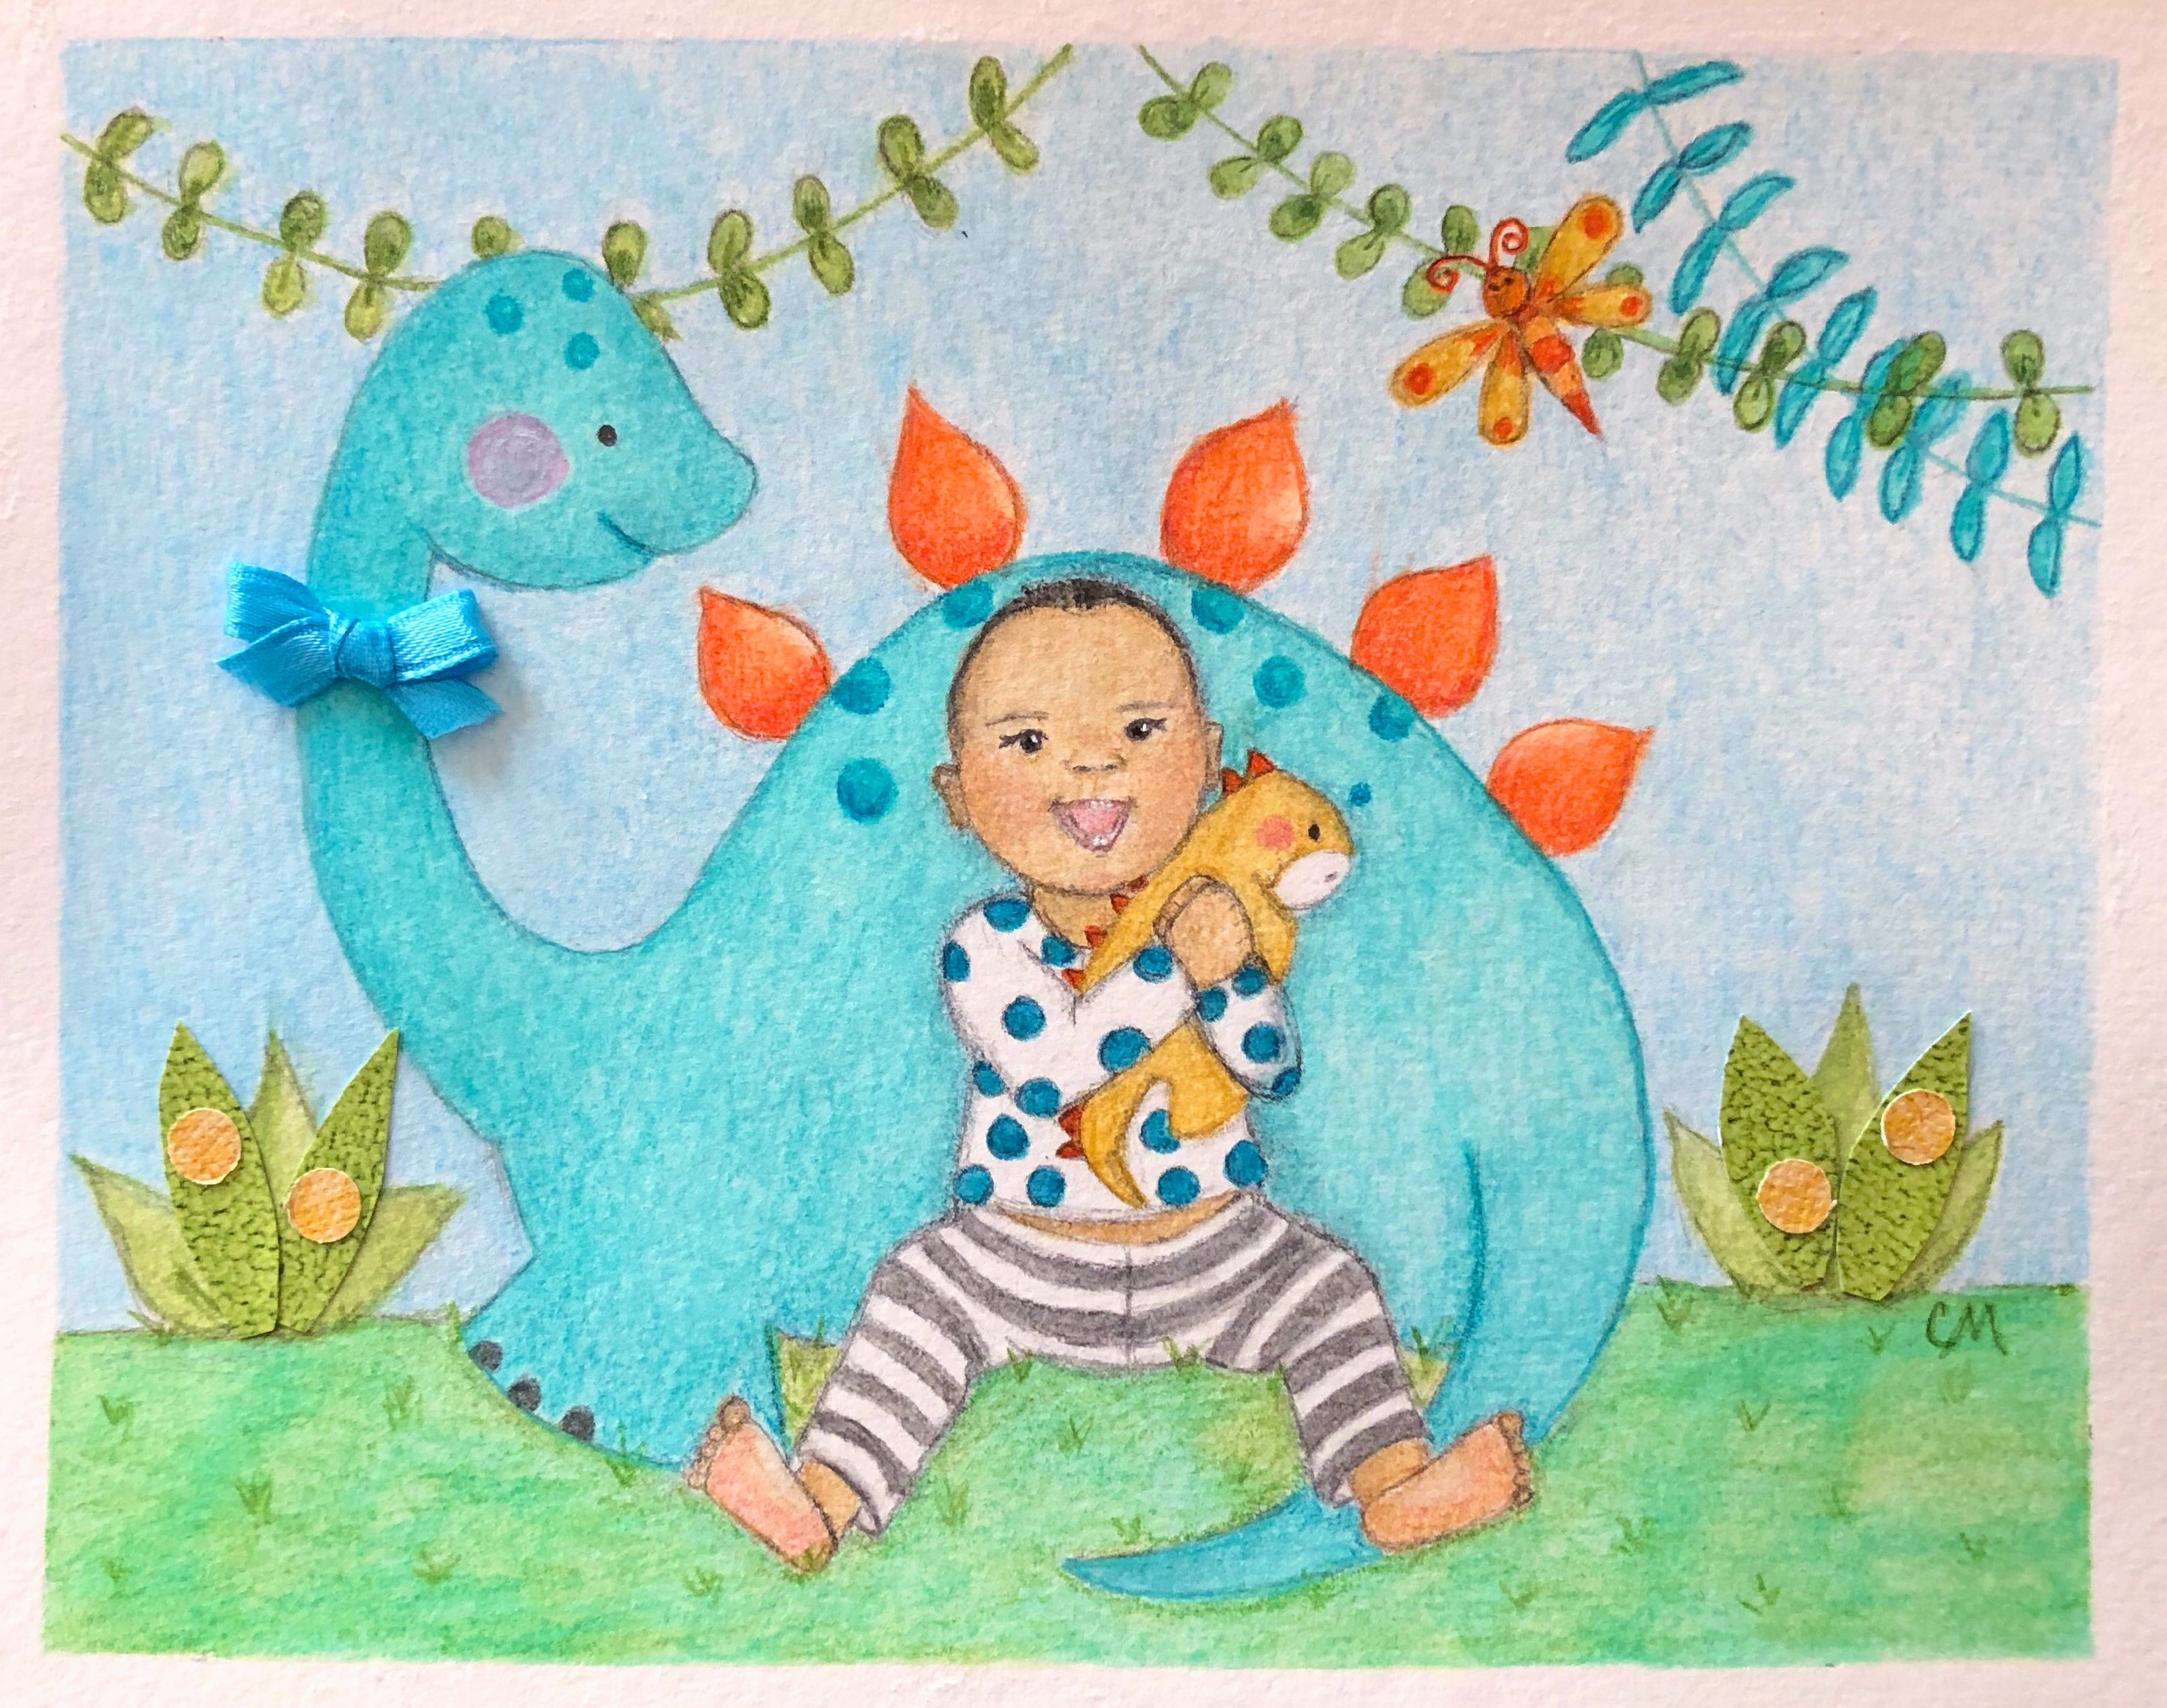 Baby loves dinosaurs